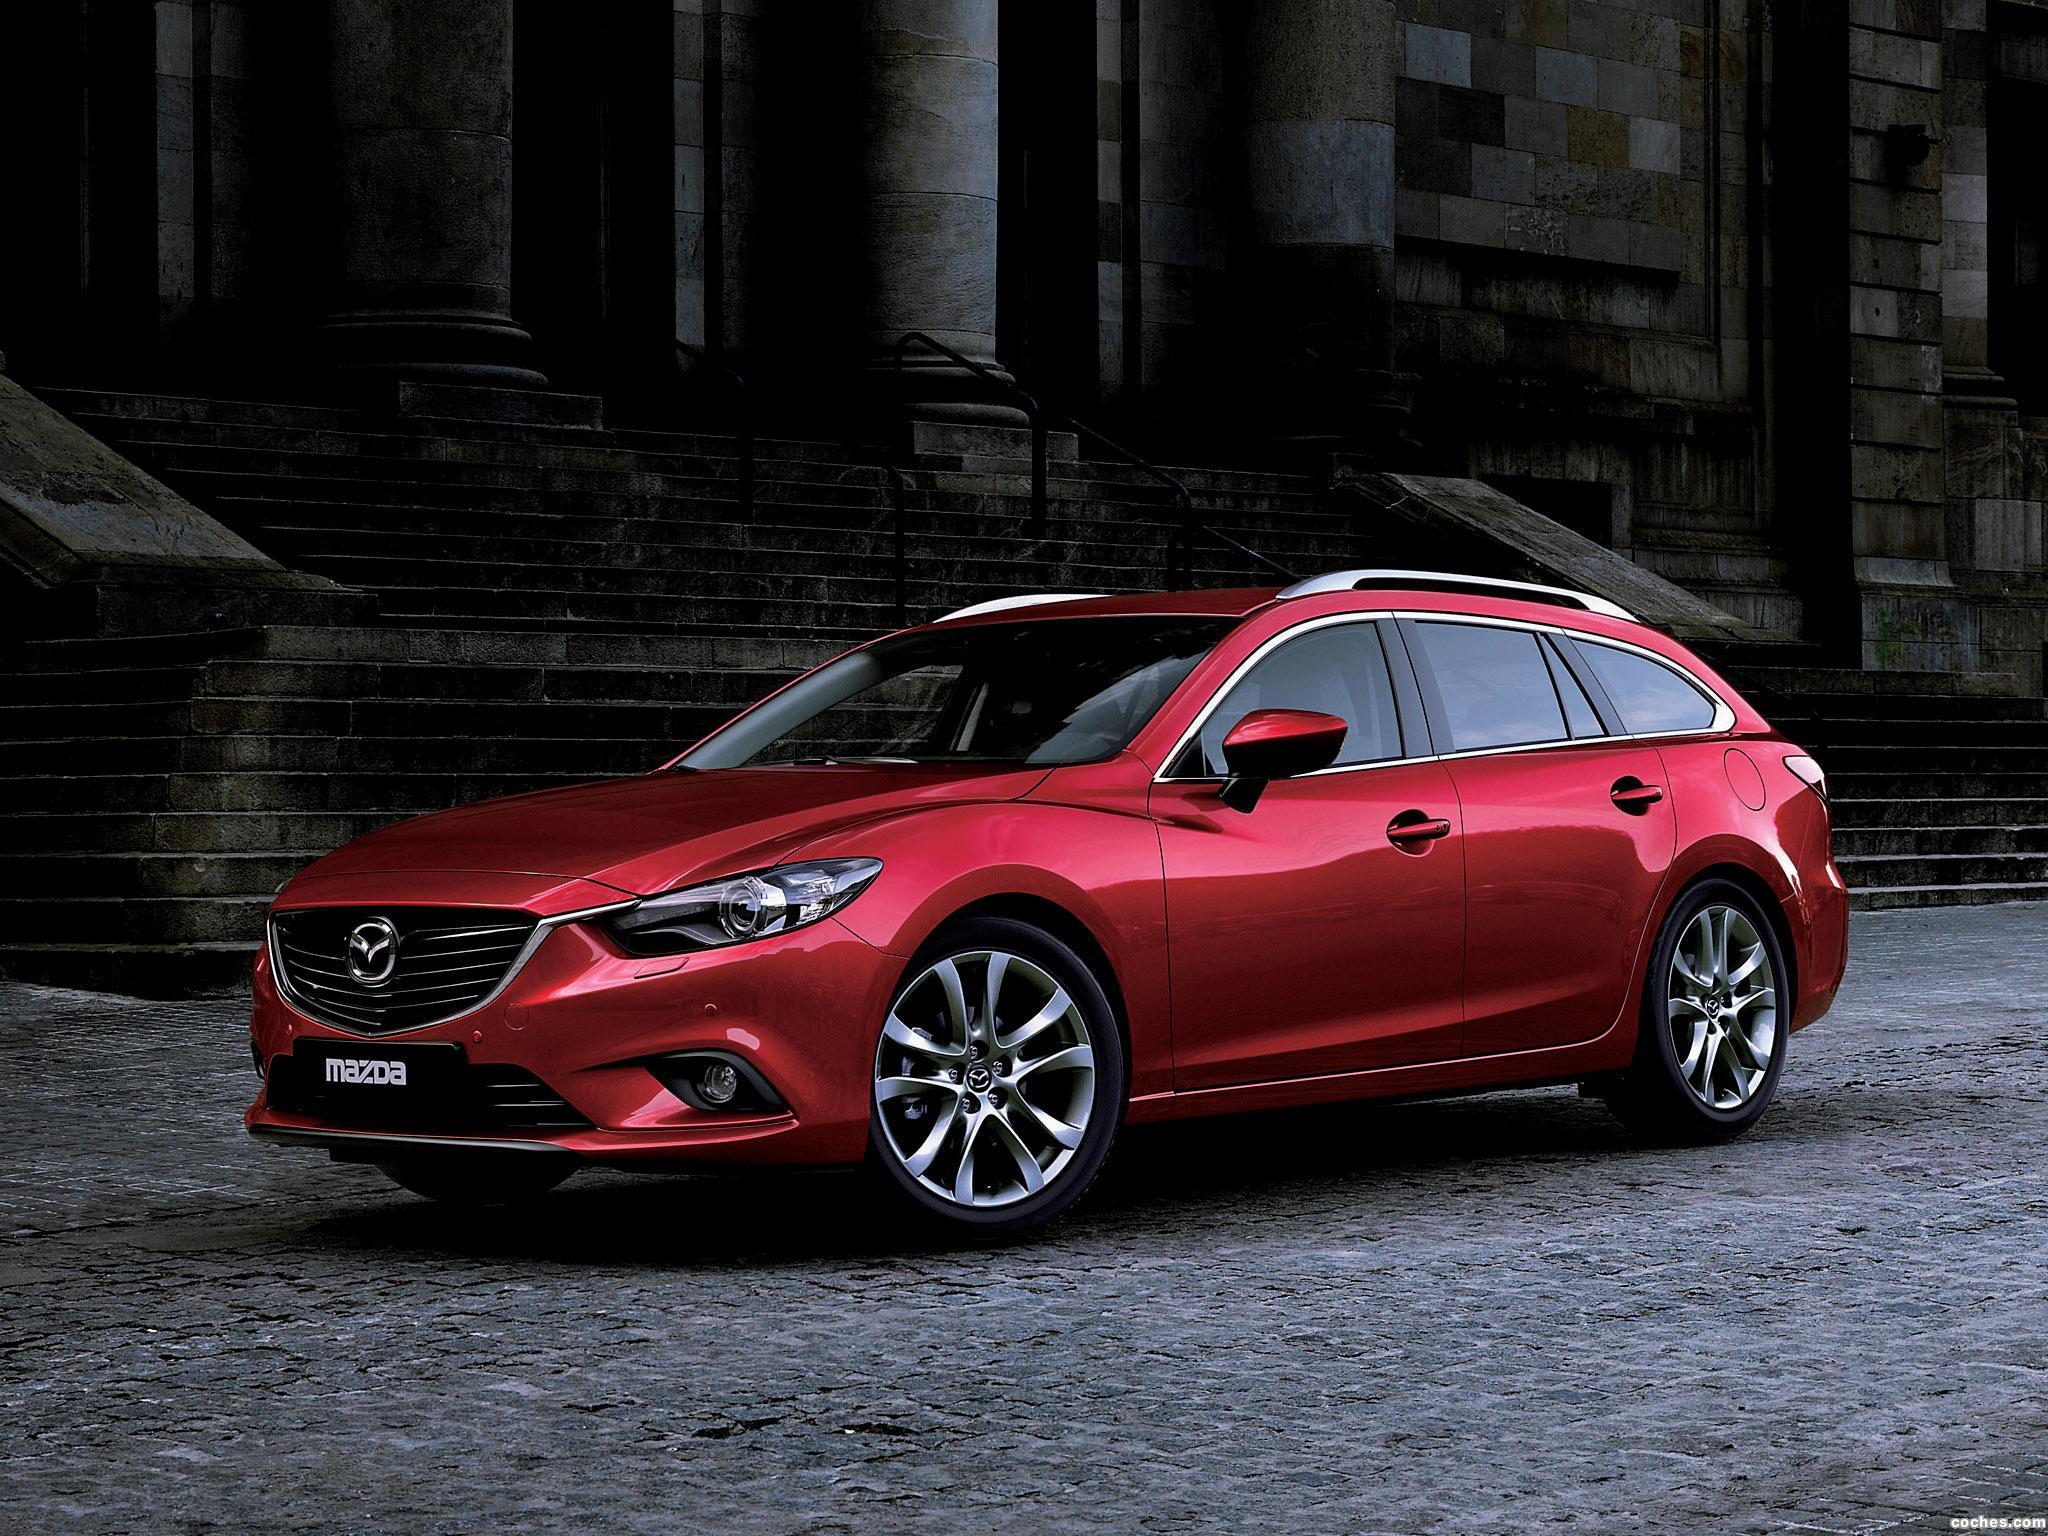 Foto 0 de Mazda 6 Wagon 2013